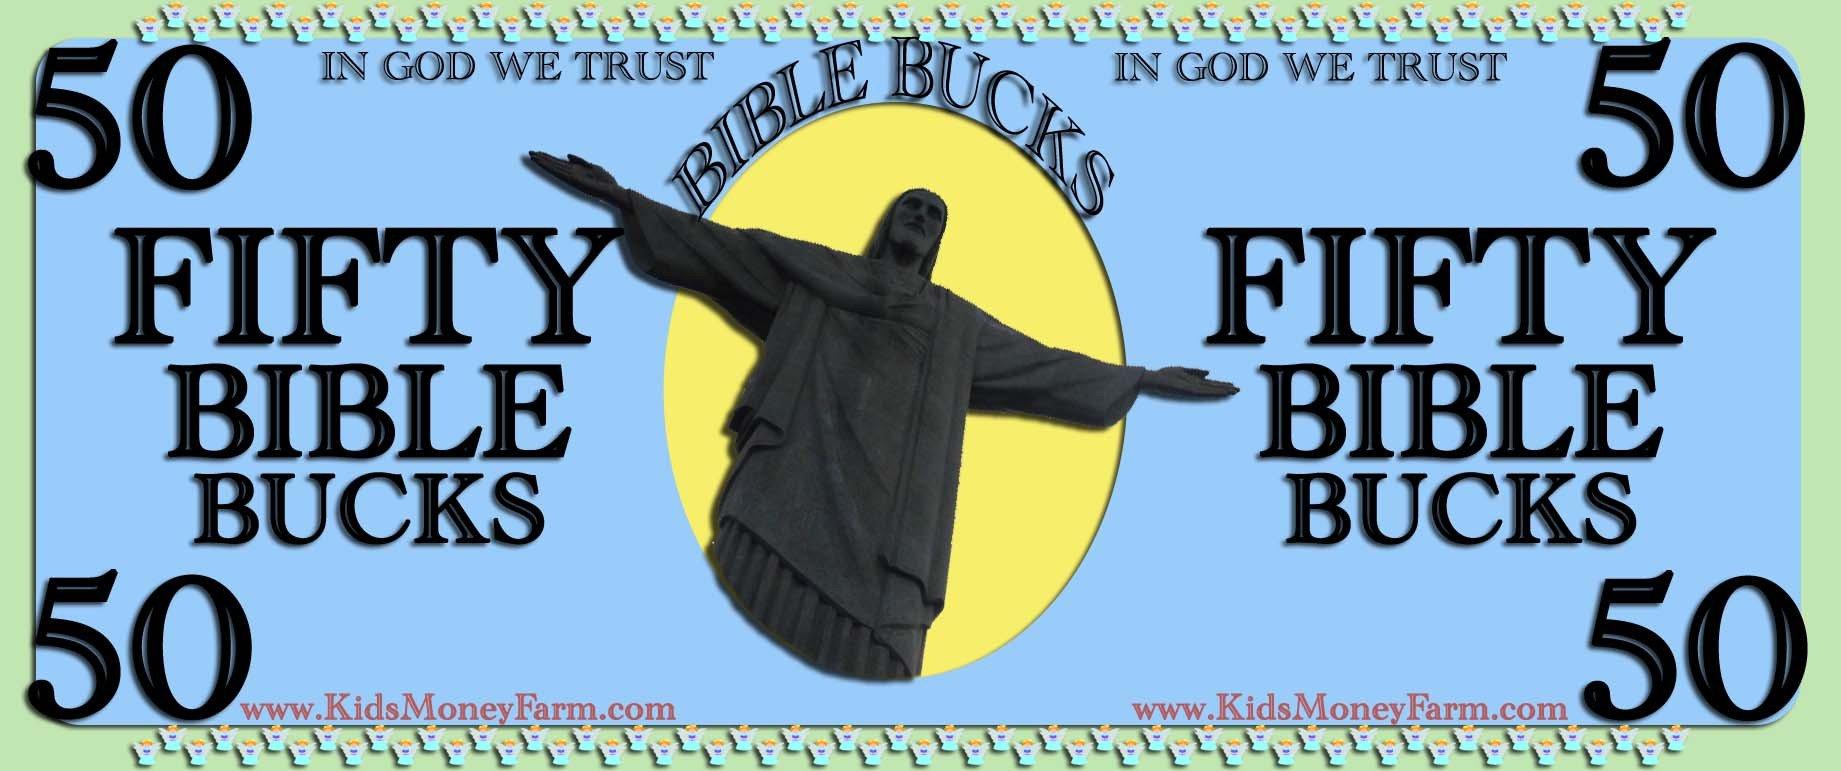 Bible Bucks Template Bible Bucks for Sunday School Kids Ministry Church – Play